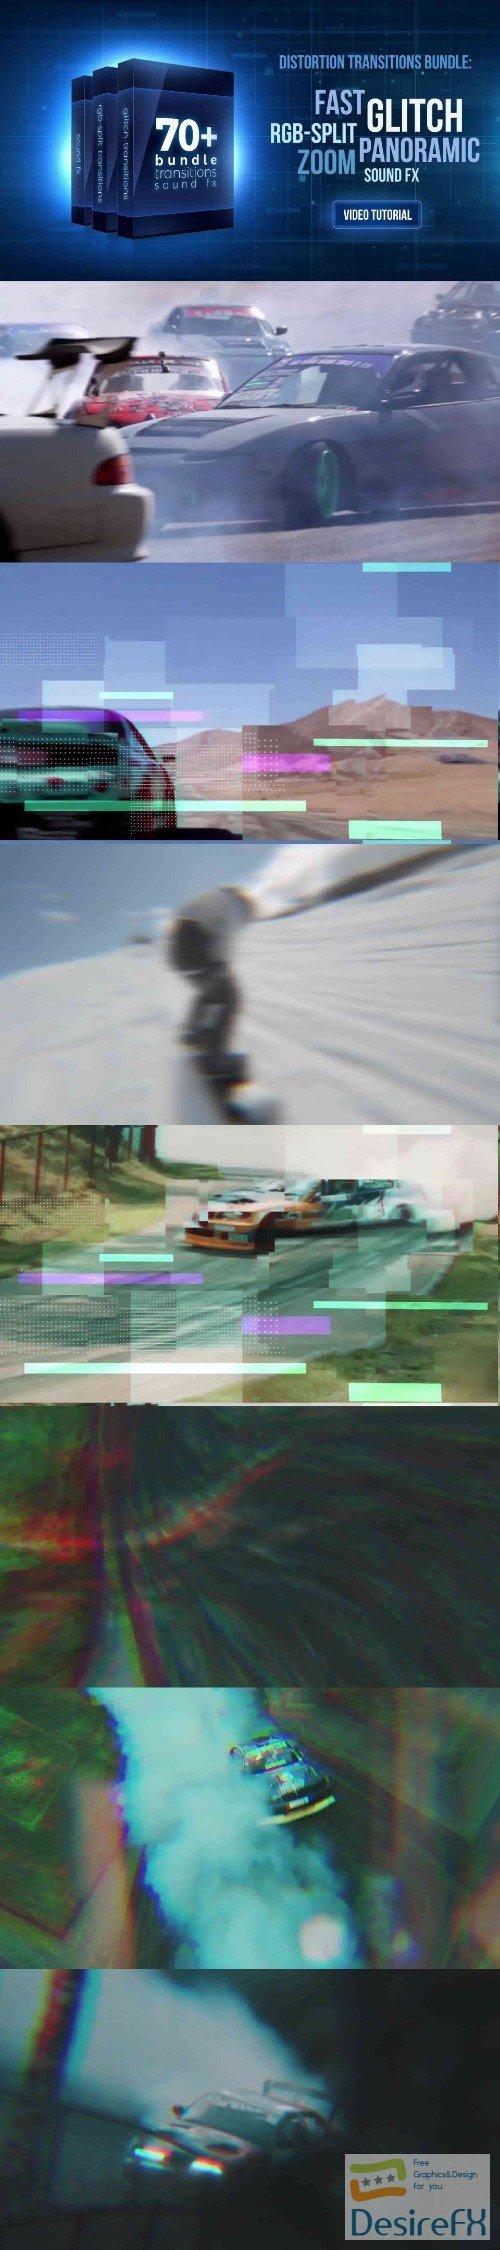 Videohive 70+ Bundle: Glitch and RGB-split Transitions, Sound FX 21470574